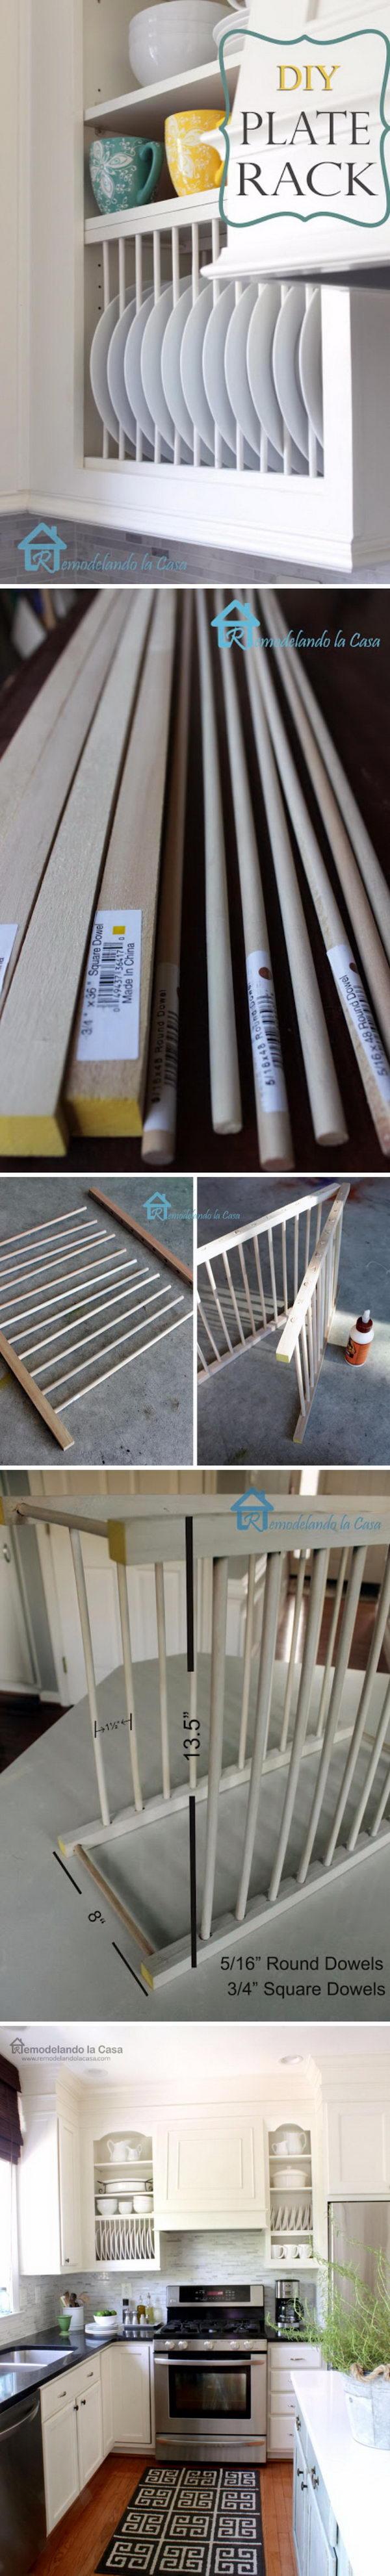 DIY Inside Cabinet Plate Rack.